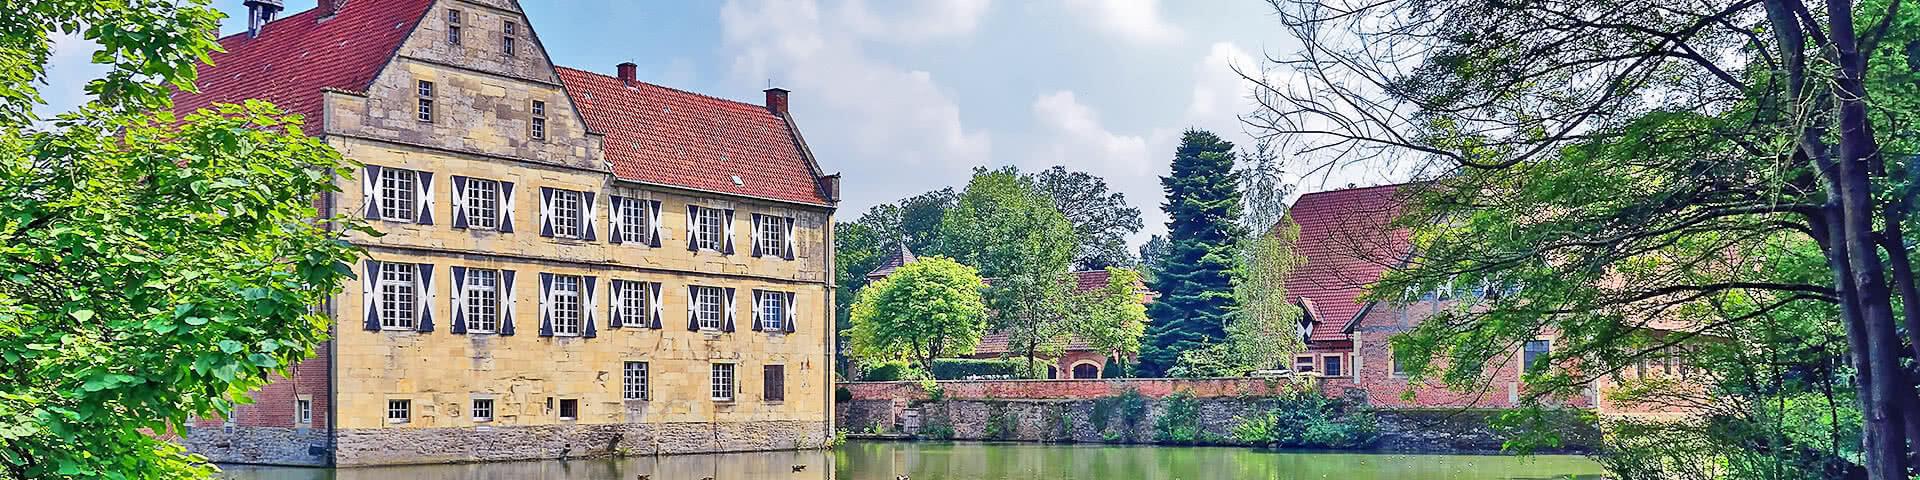 Burg Hülshoff bei Münster